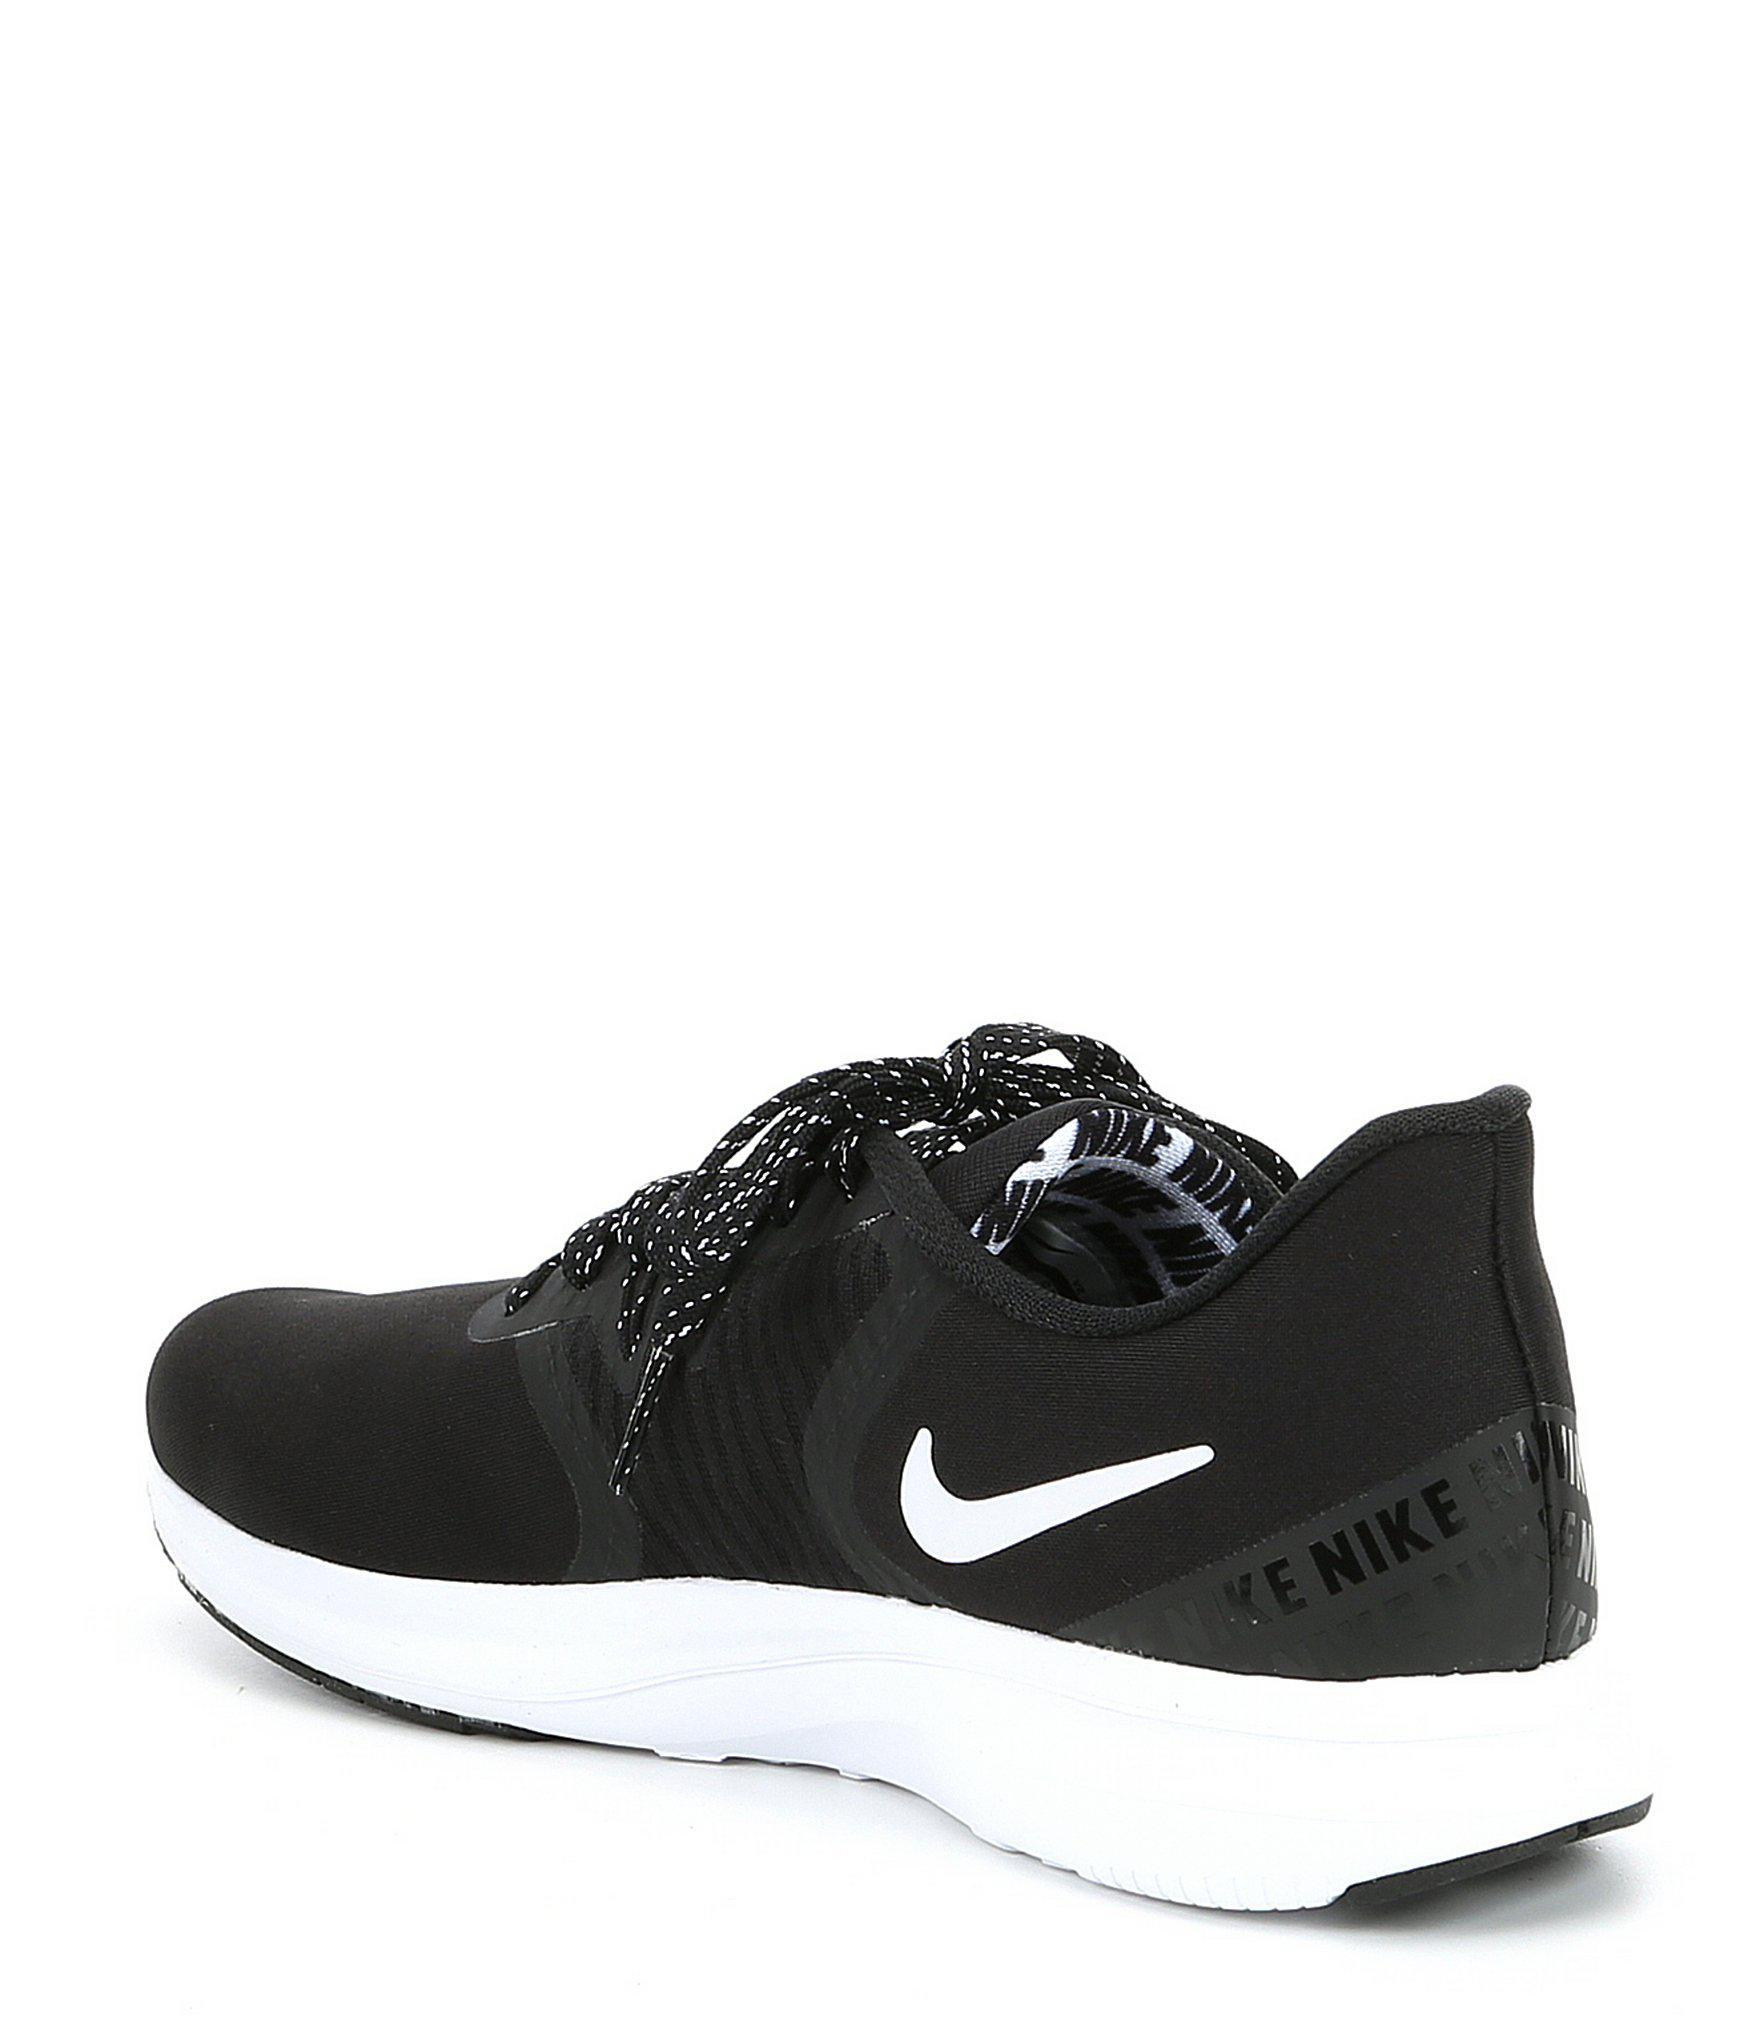 c7a24ddaa728 Nike - Black Women s In-season Tr 8 Print Training Shoe - Lyst. View  fullscreen